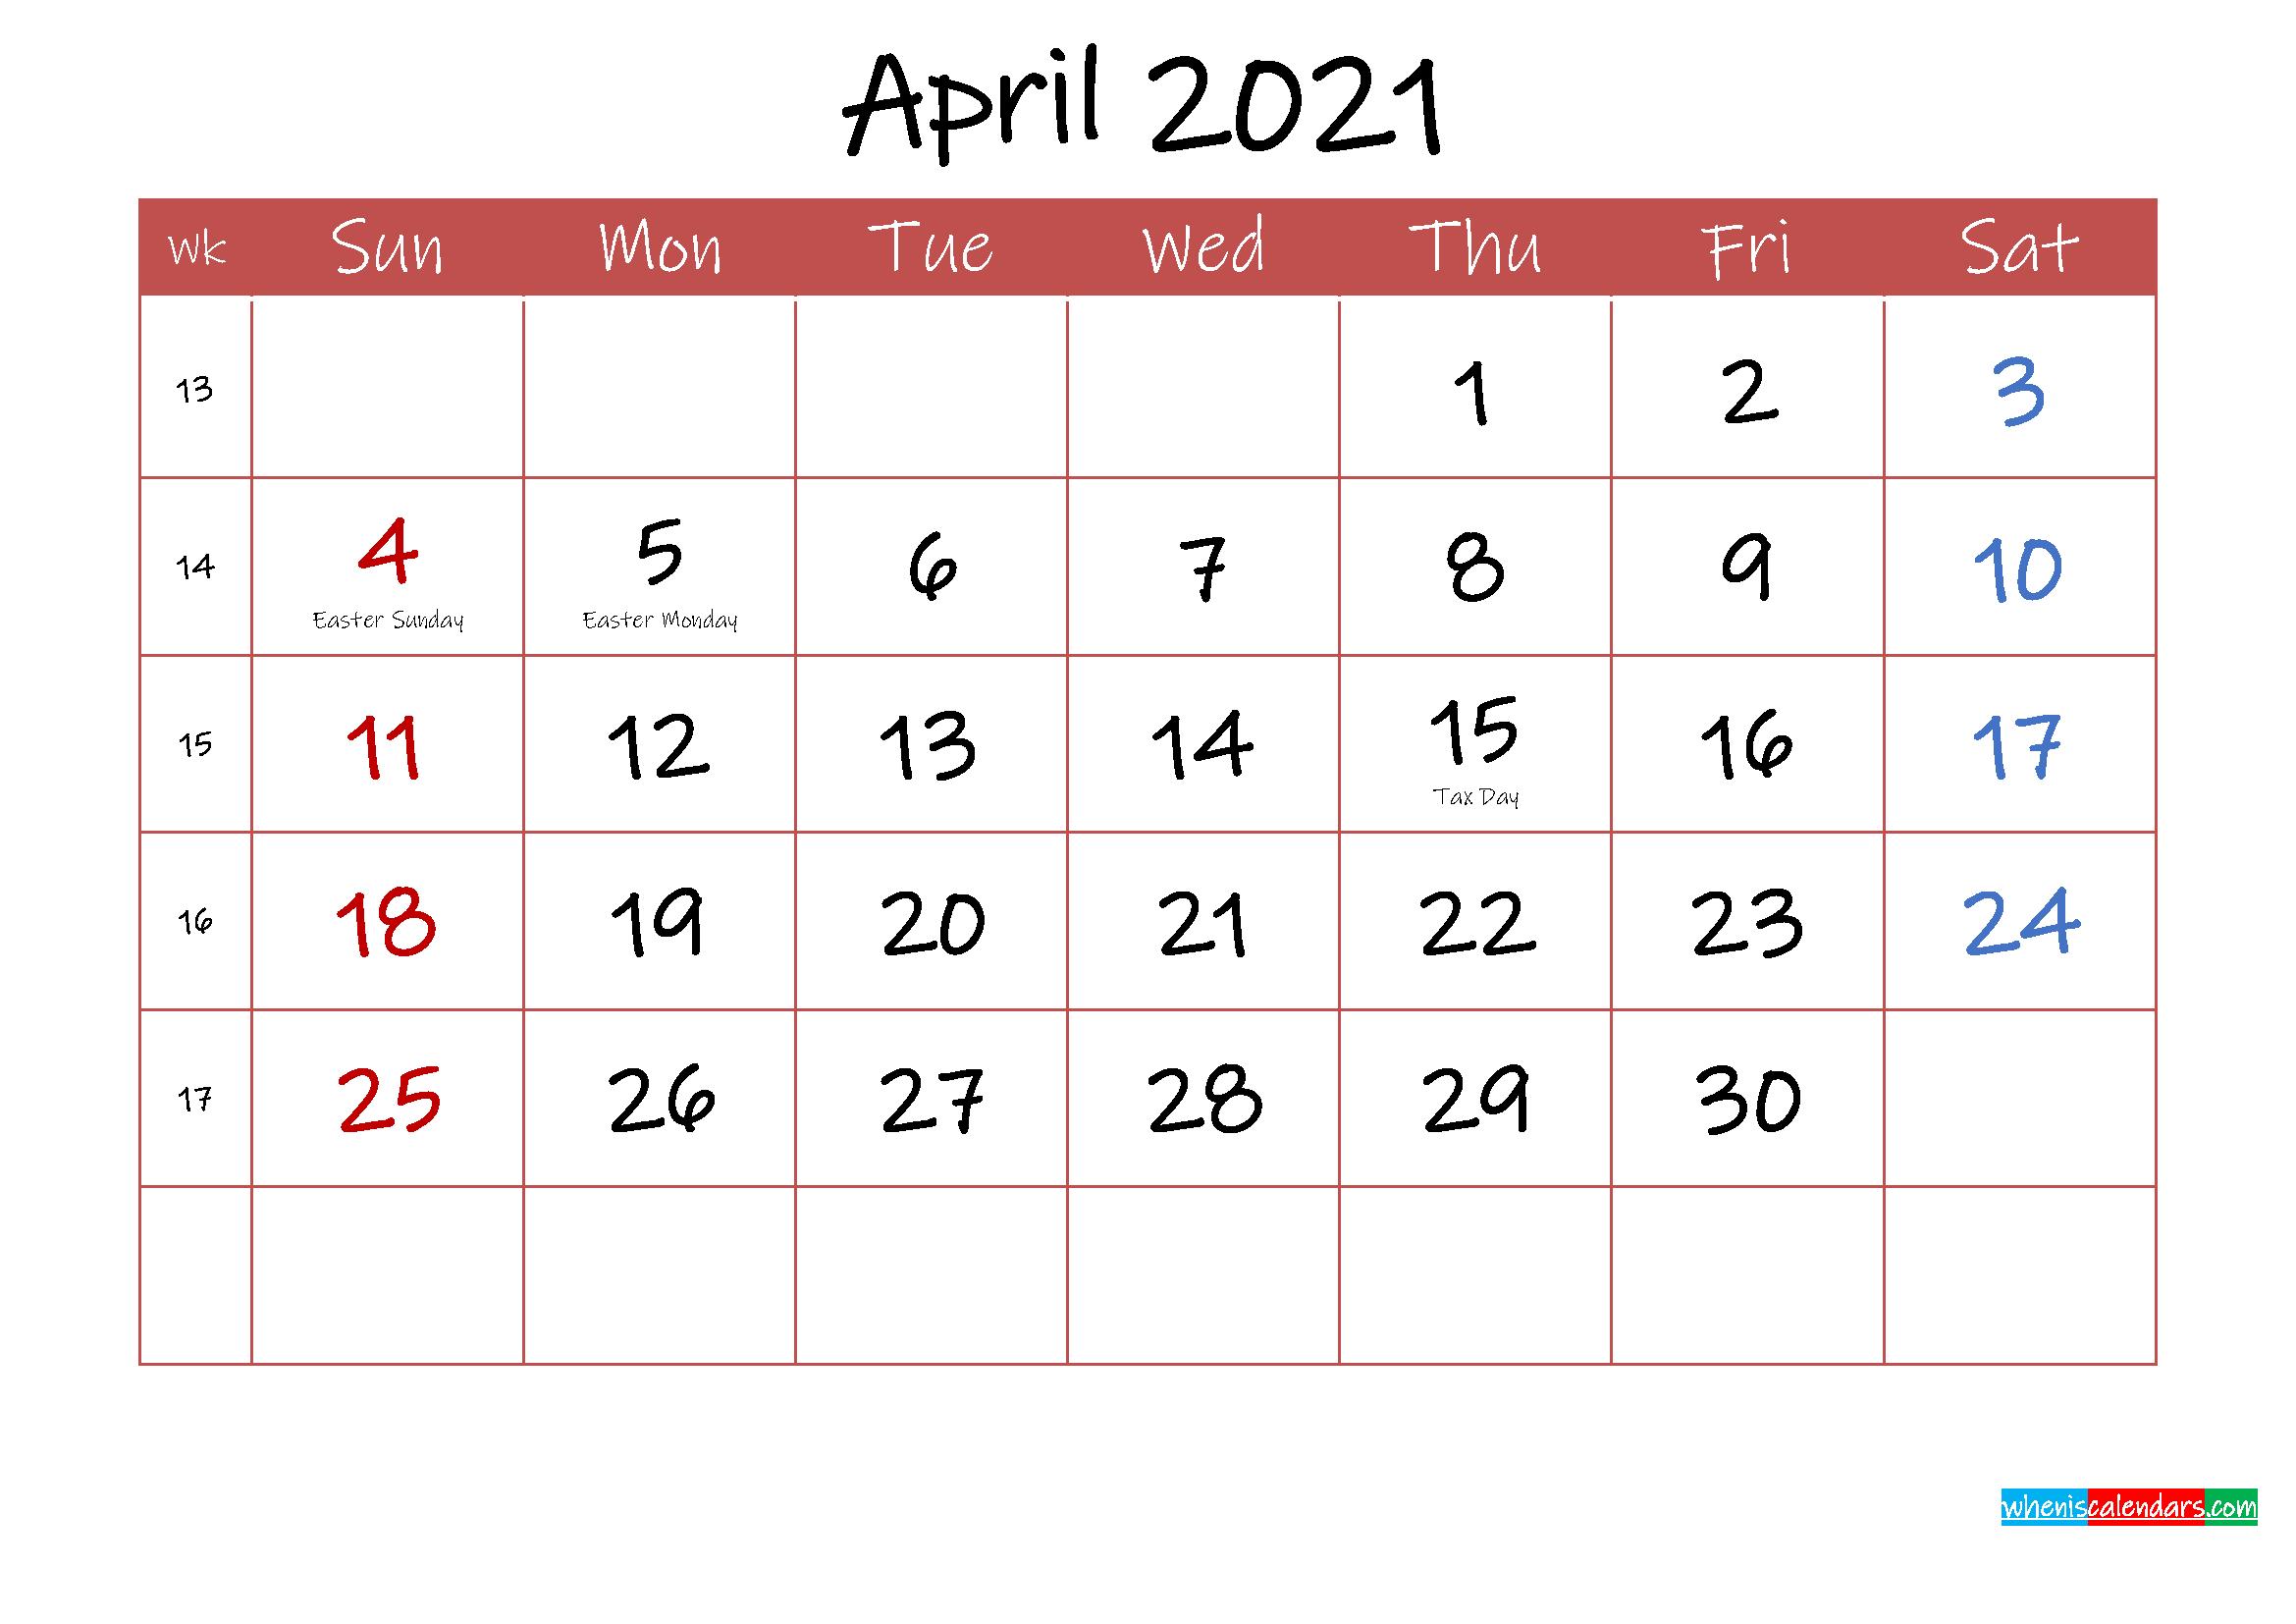 Printable April 2021 Calendar With Holidays - Template